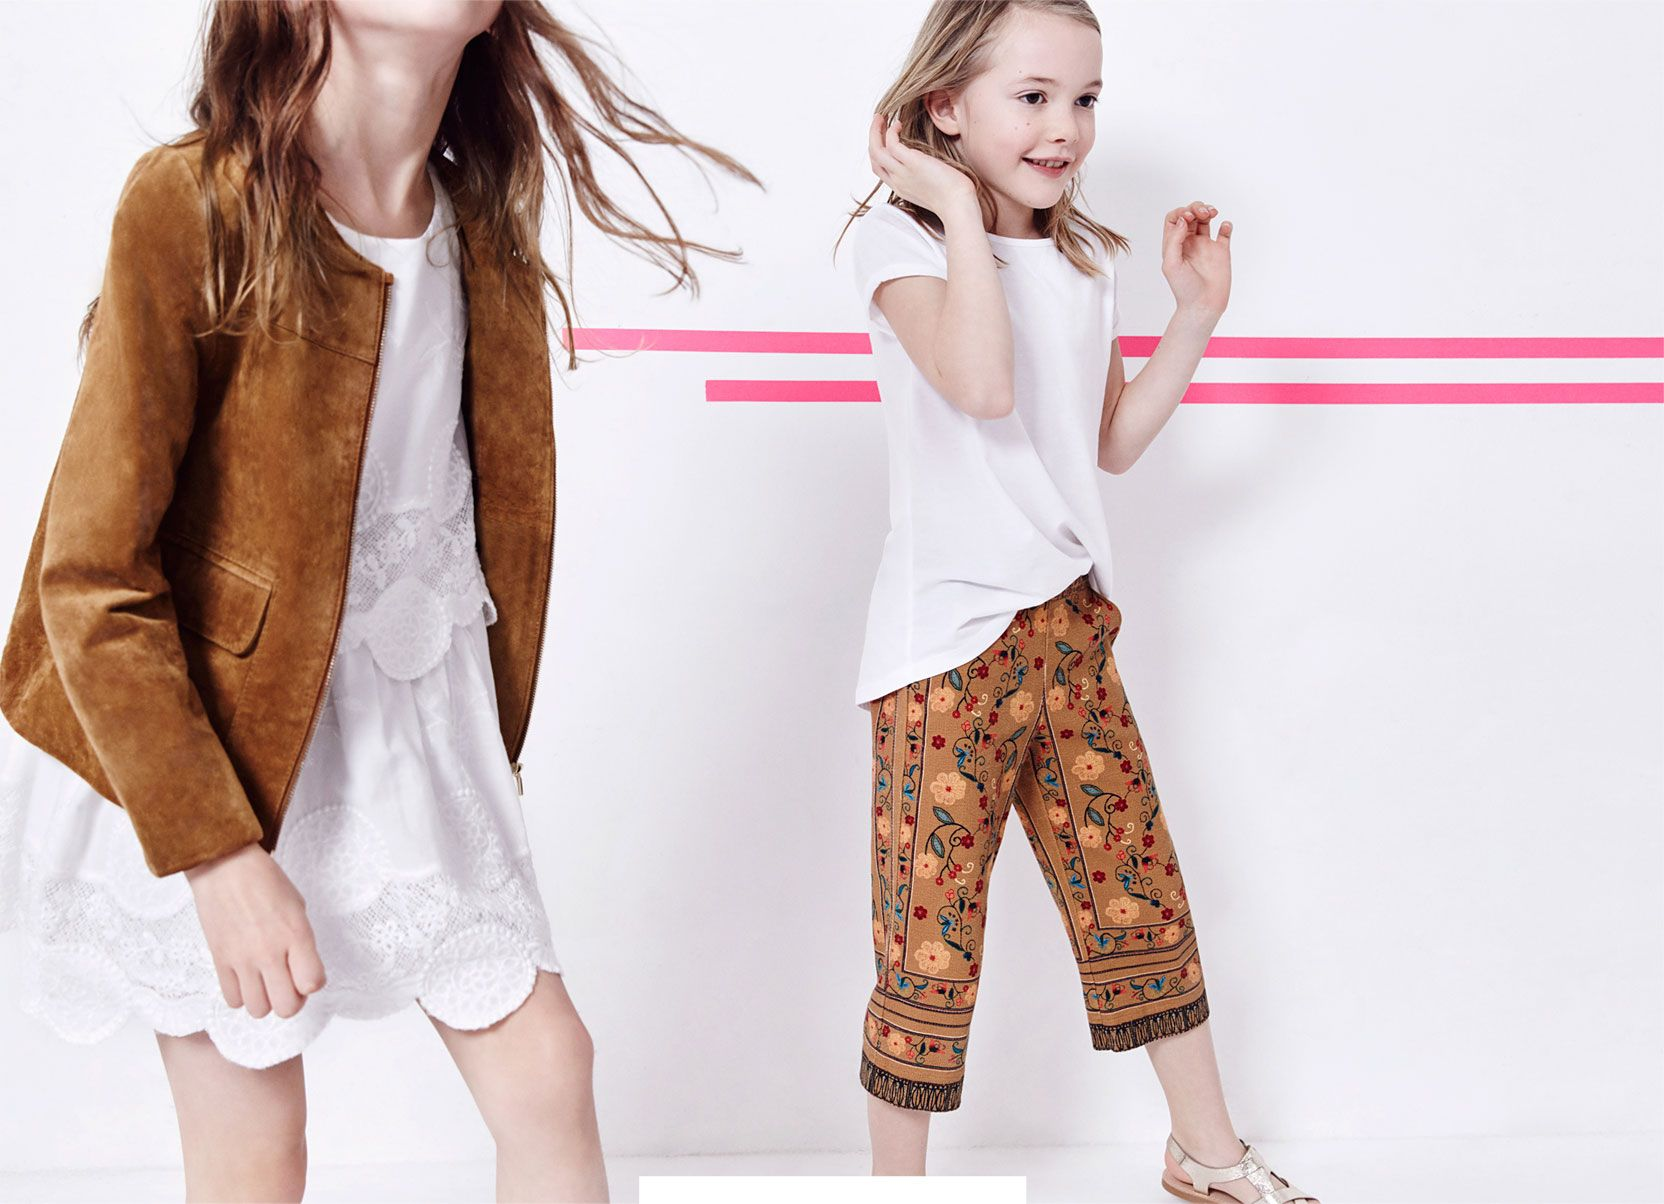 aaf6a5c35 ZARA - #zaraeditorials - GIRLS / THE SPRING REPORT | Children's ...